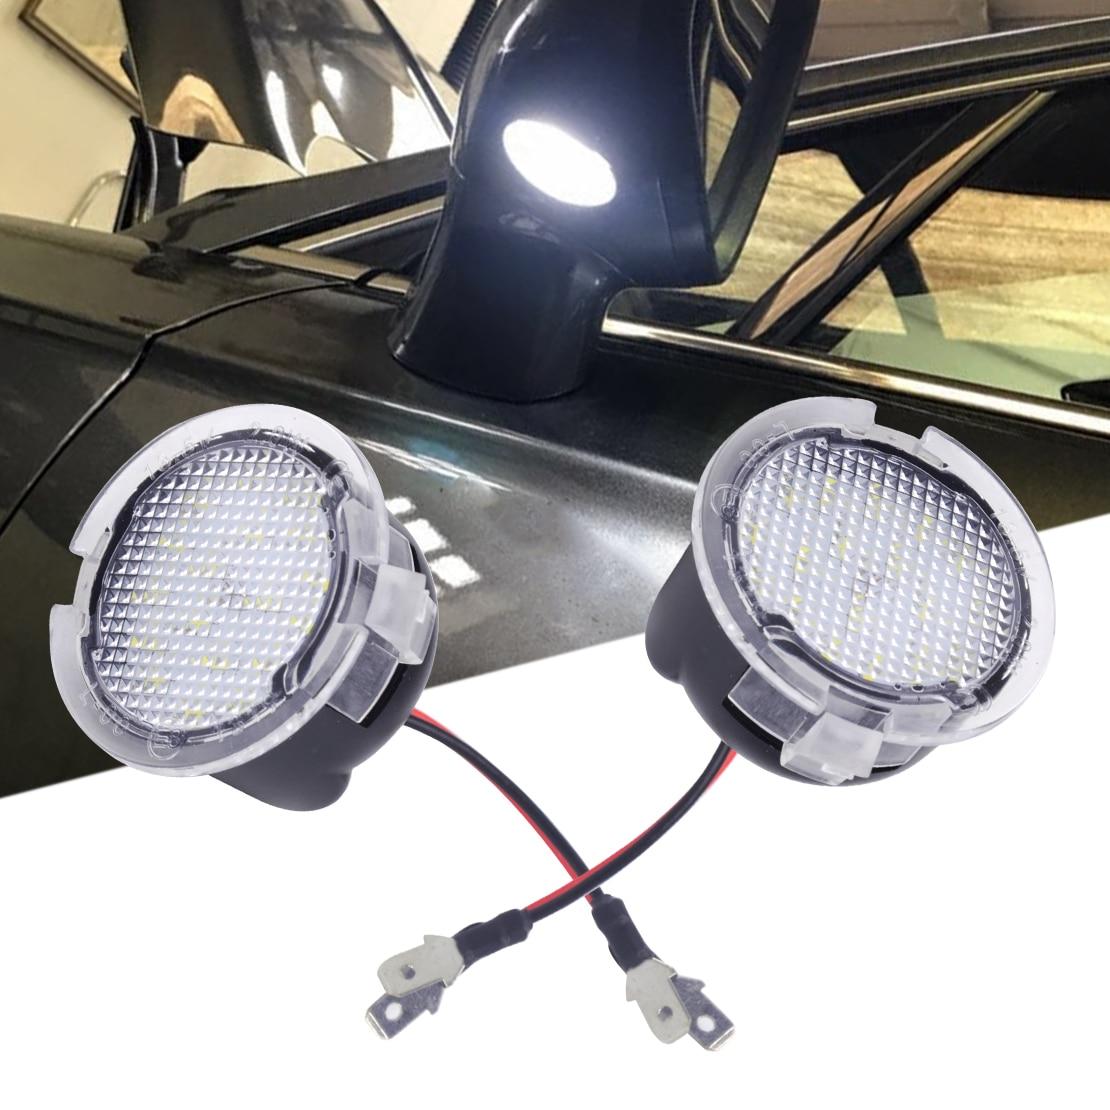 CITALL 2 piezas de alta potencia LED blanco espejo lateral charco luces apto para Toyota Tundra 2007-2010, 2011 de 2012 2013, 2014, 2015, 2016, 2017